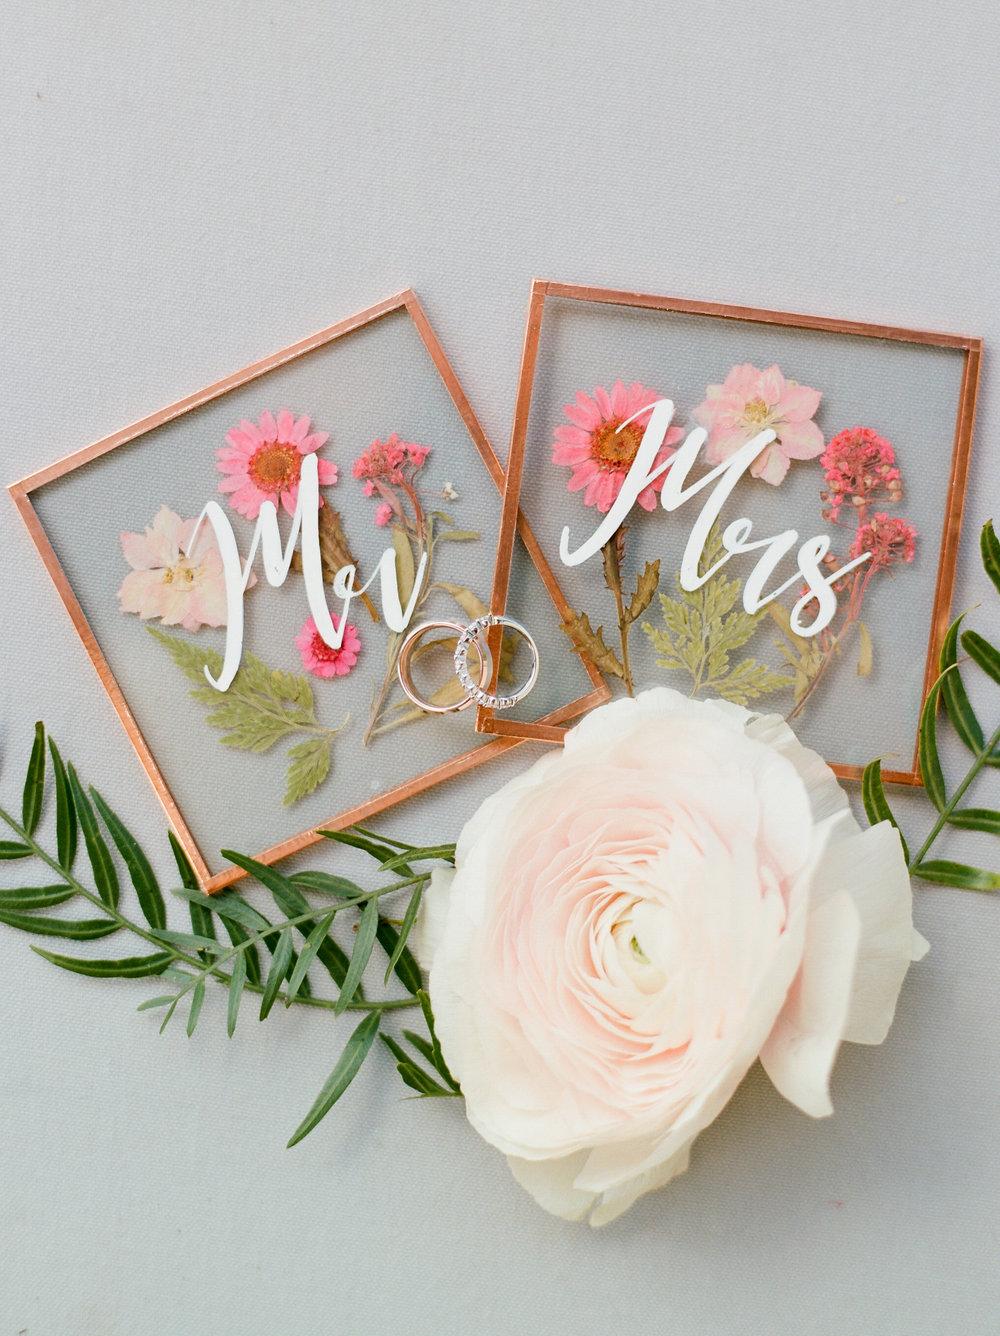 Florals: Flower Vibes, Styling: Dana Fernandez